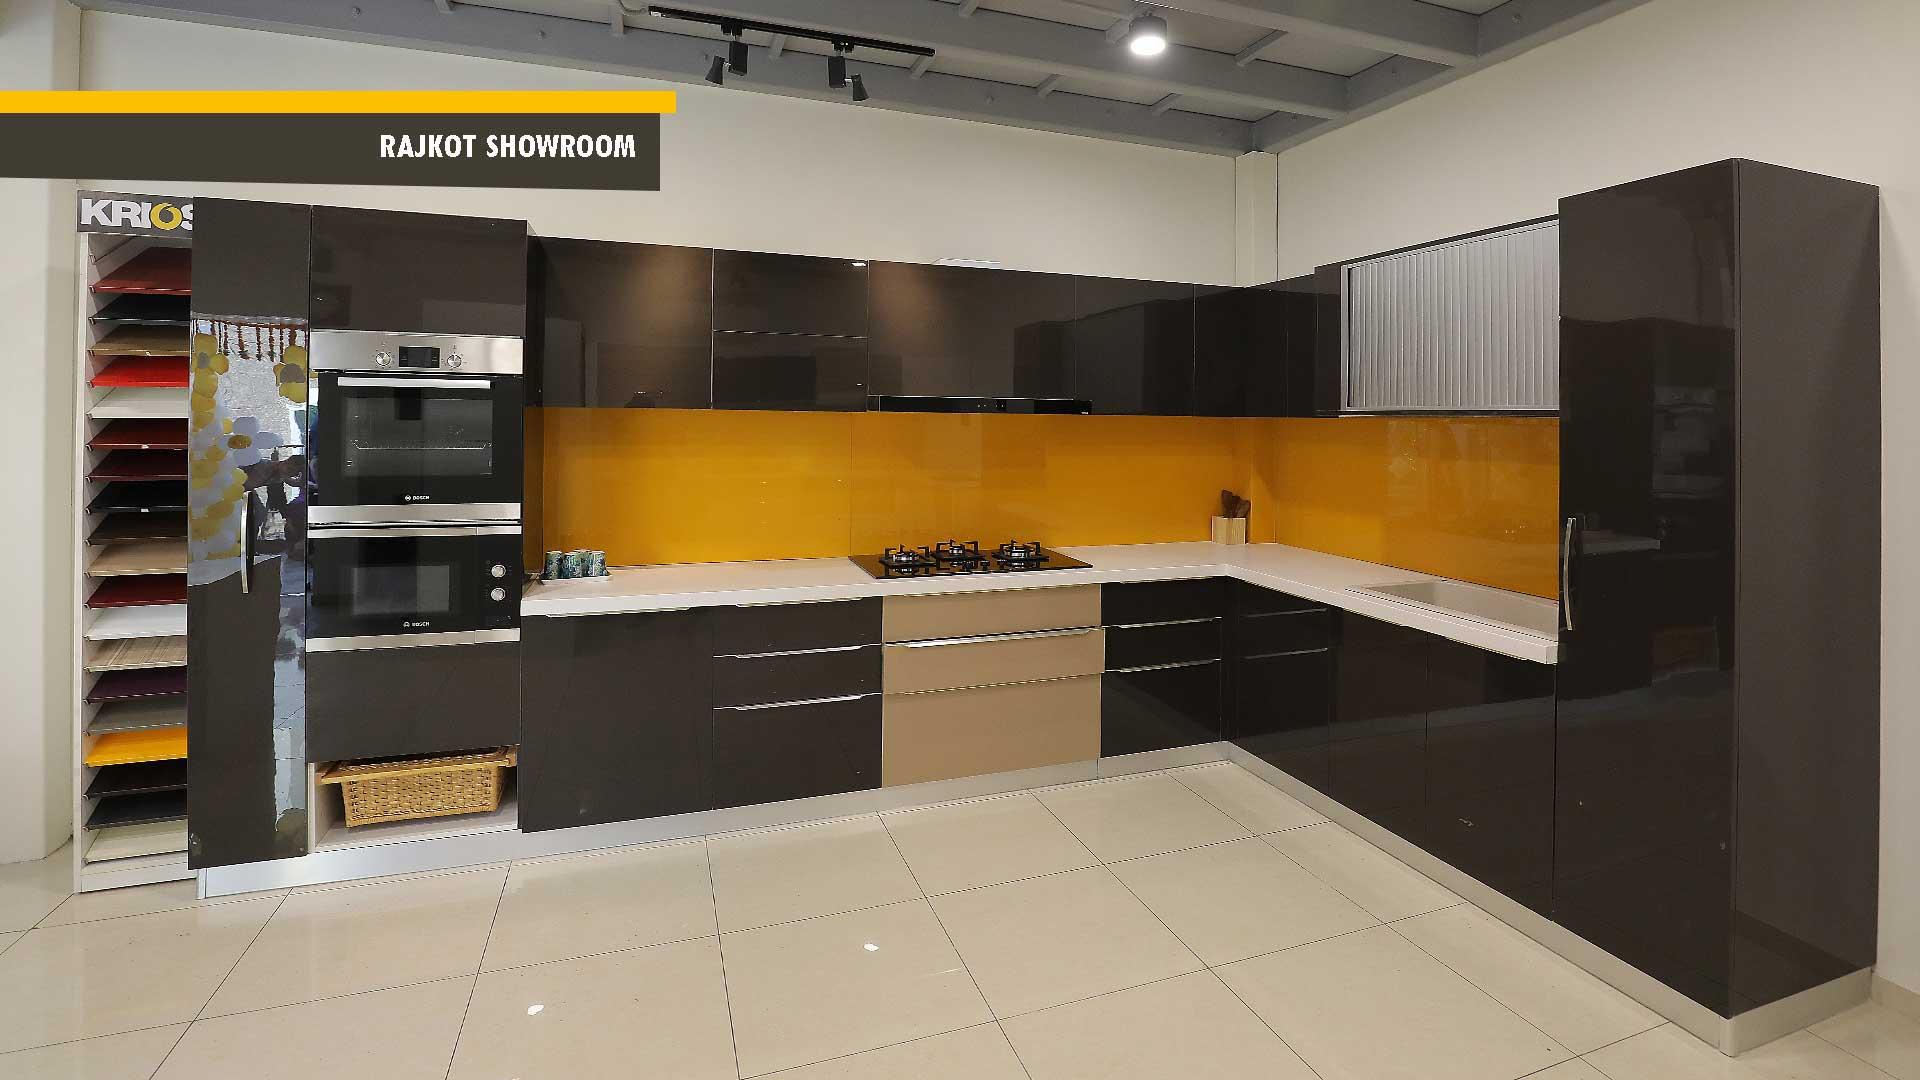 modular kitchen tile floors kitchens ahmedabad buy online remarkably crisp and clear